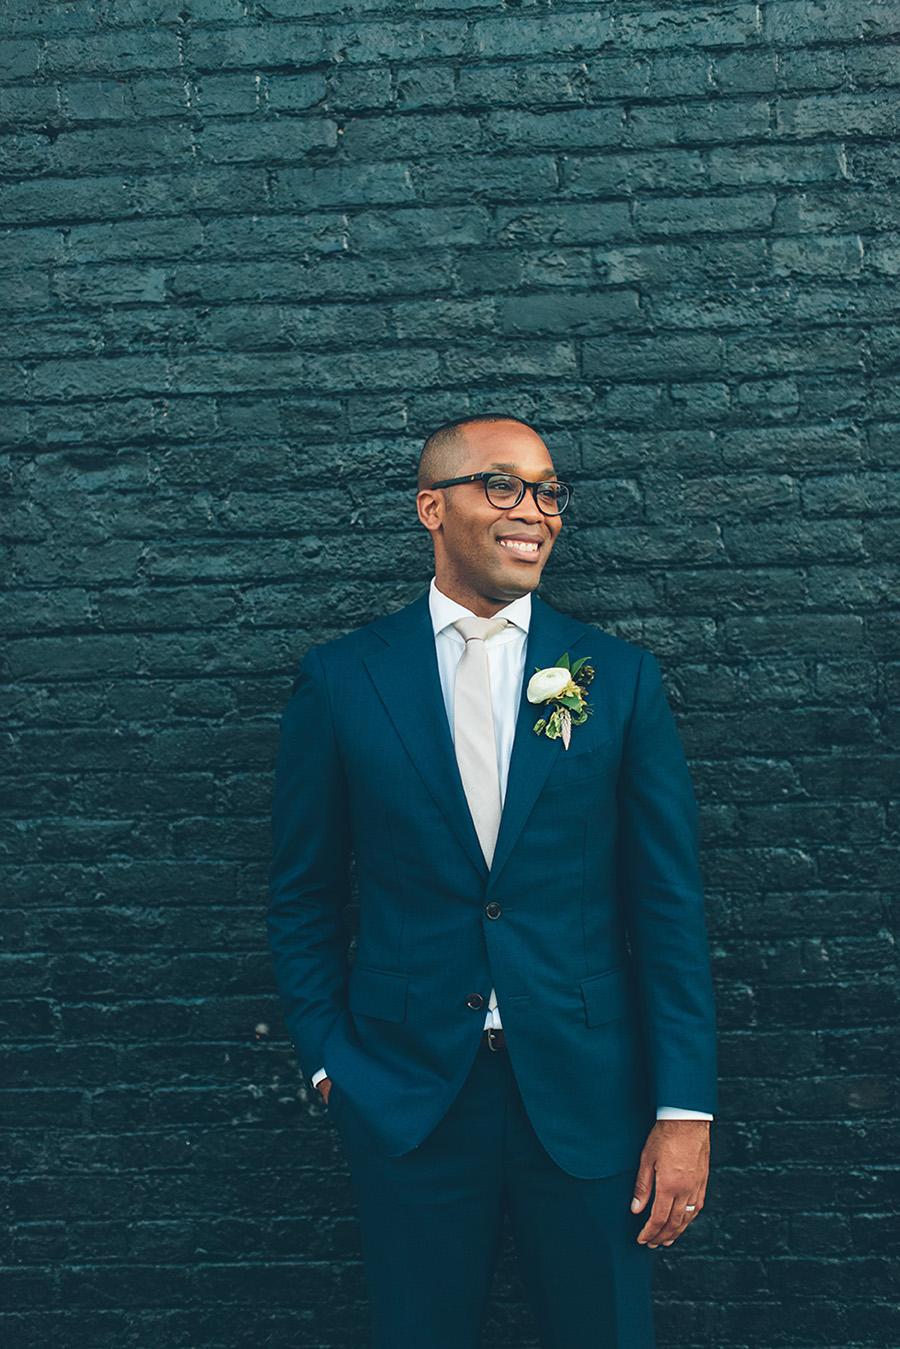 NYC-WEDDING-PHOTOGRAPHER-CITYHALL-ELOPEMENT-501-UNION-BROOKLYN-WEDDING-JILL-JUSTIN0016.jpg